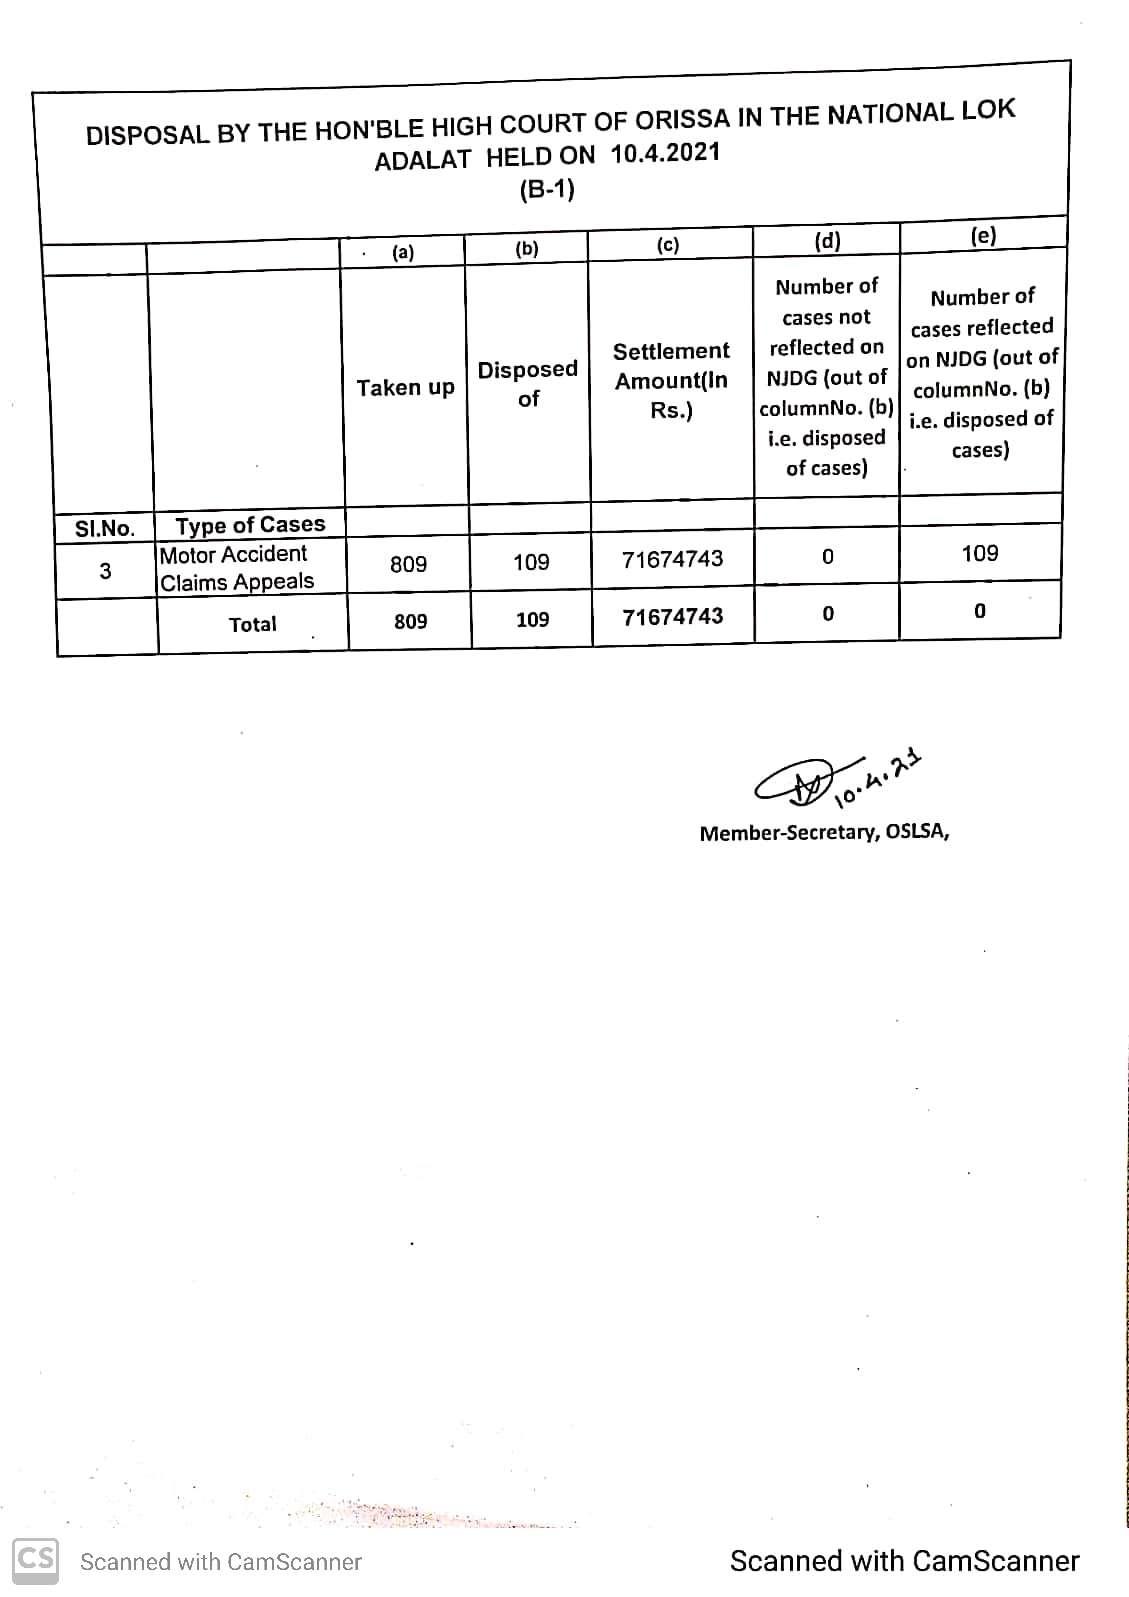 National Lok Adalat disposal figure of Orissa High Court held on 10.04.2021